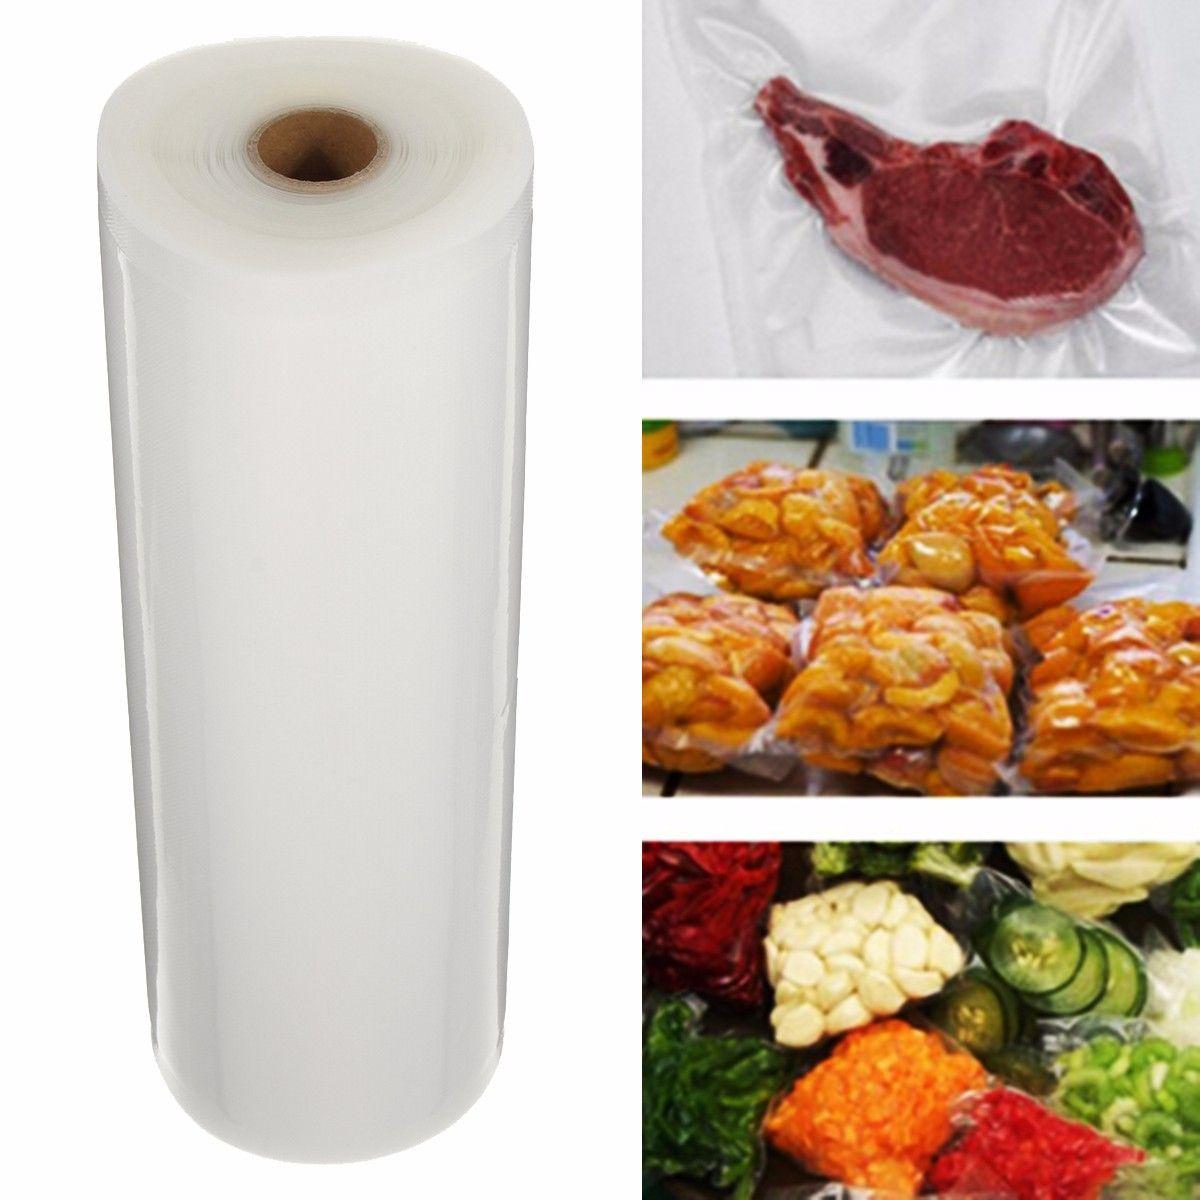 Eco-friendly Food Vacuum Storage Kitchen Meal Sealing Food Saver Bags